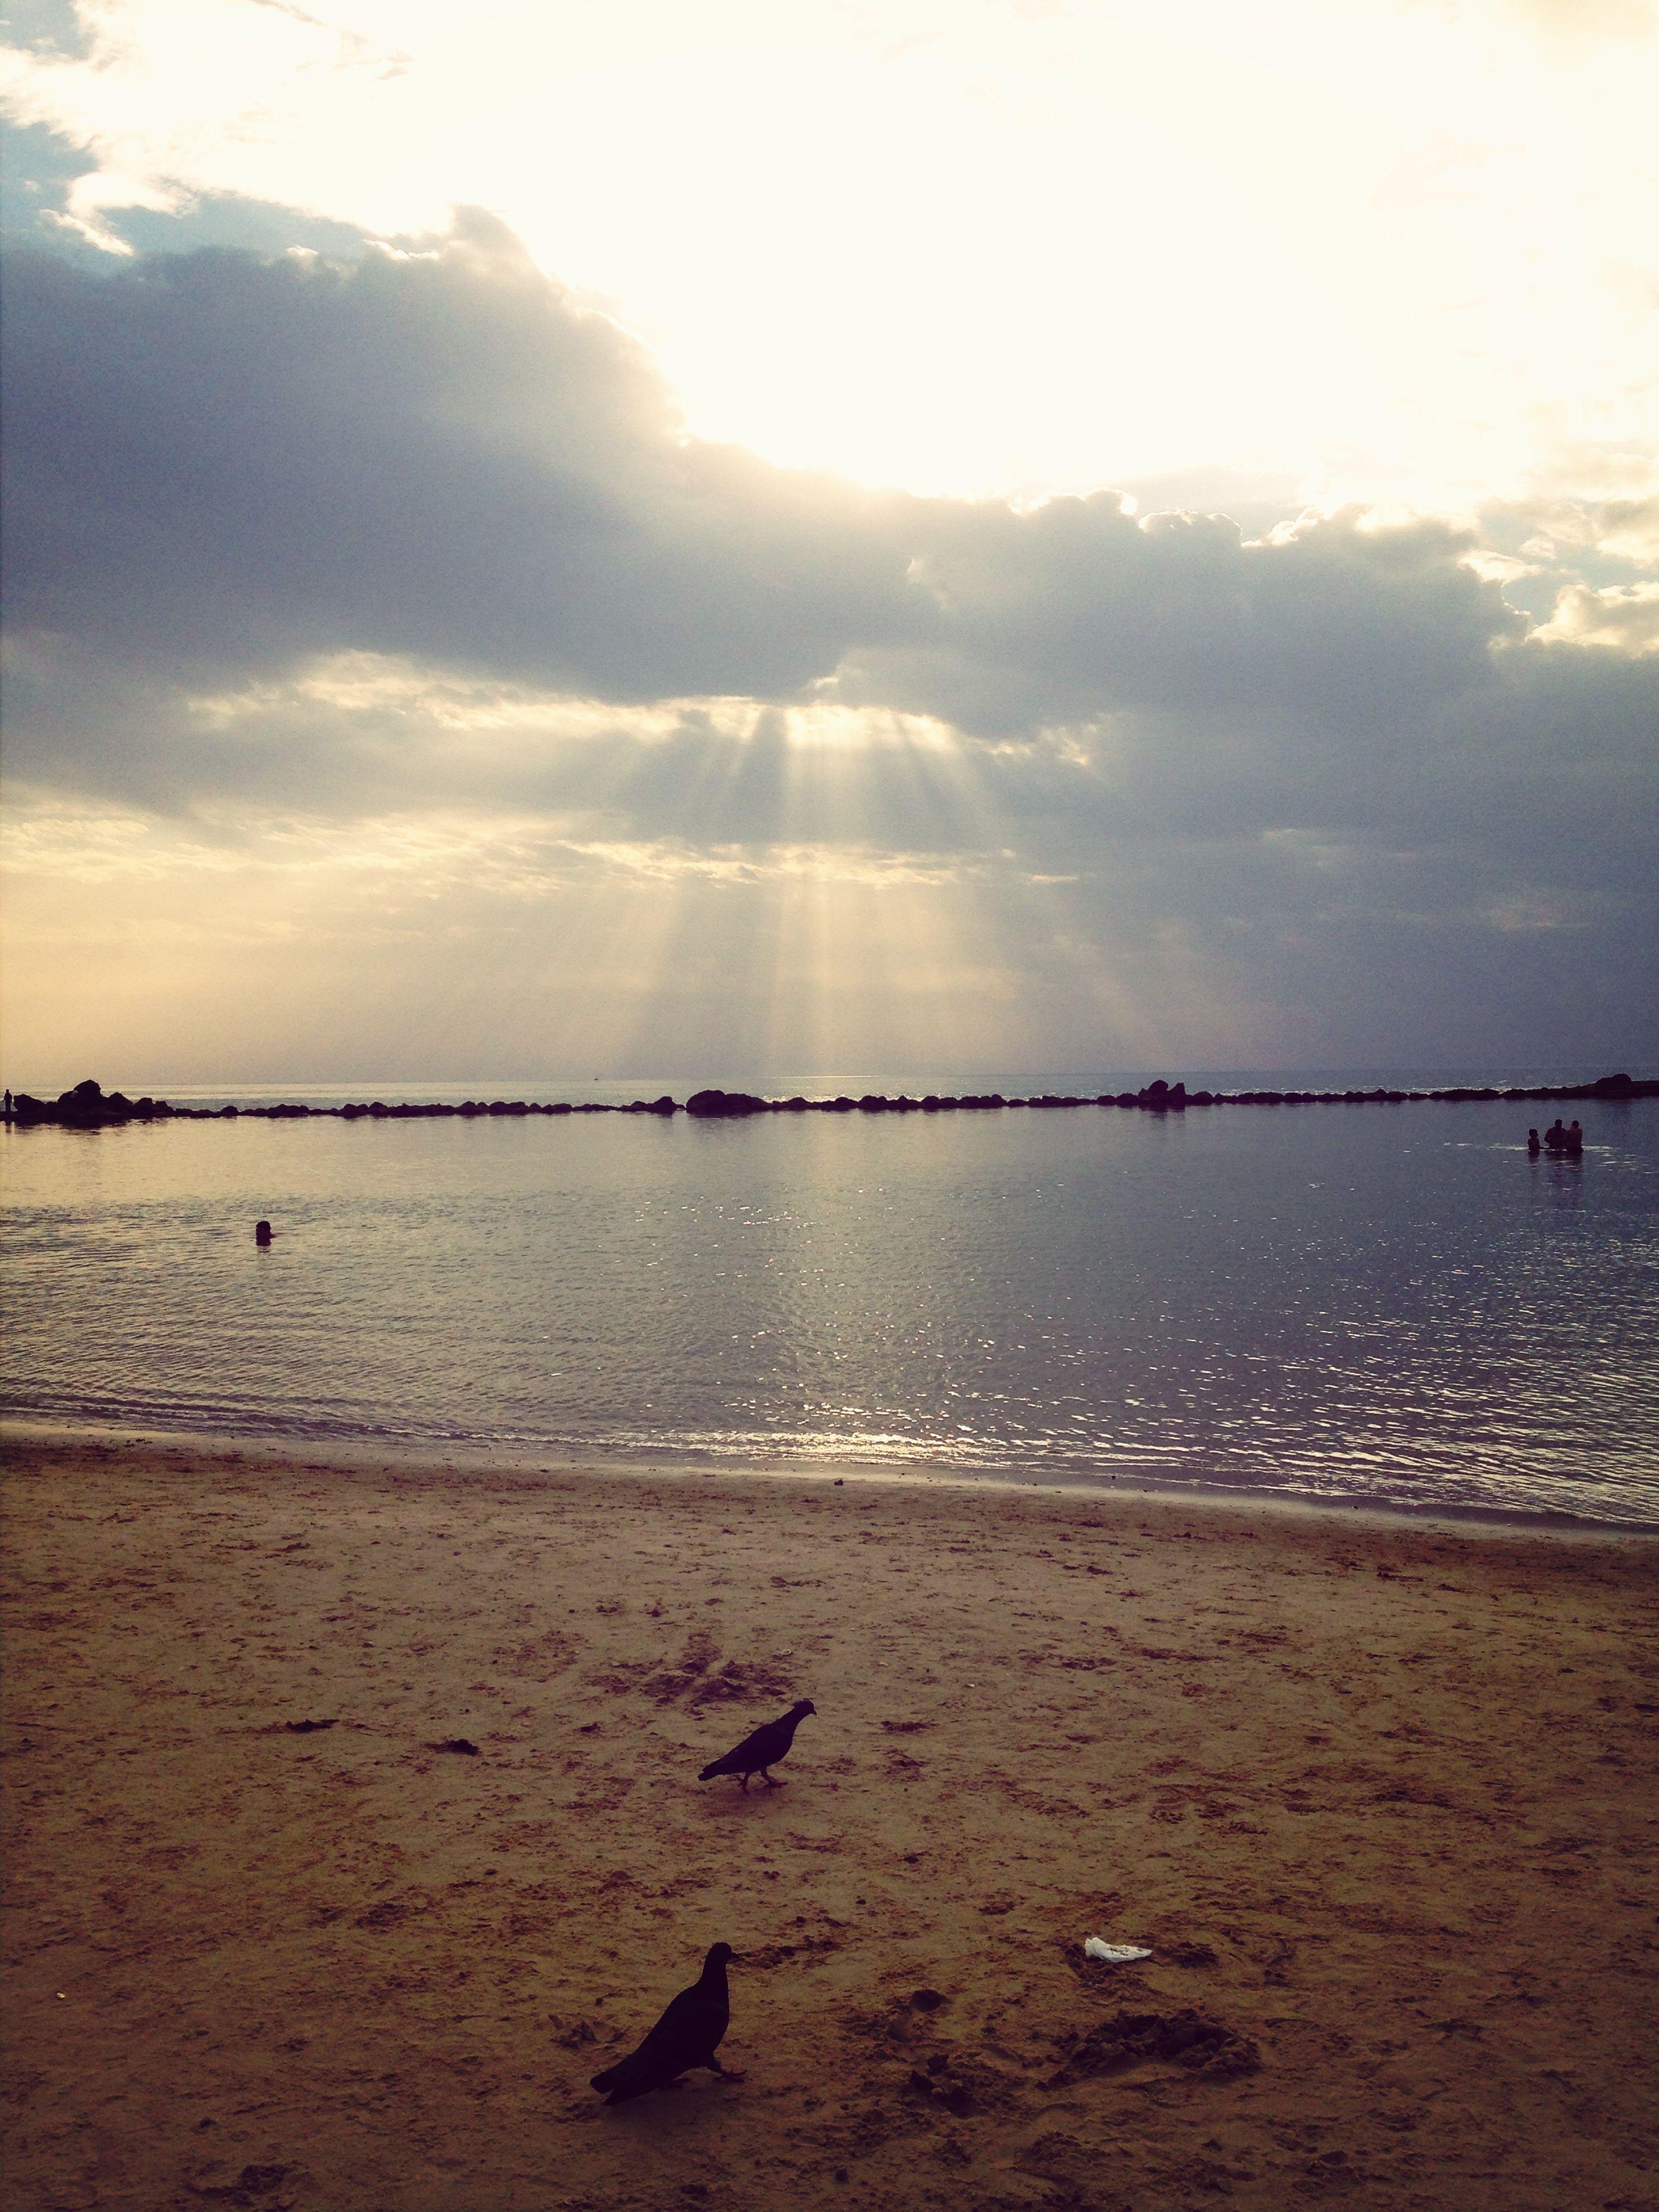 water, sea, sky, beach, scenics, tranquil scene, shore, cloud - sky, tranquility, beauty in nature, horizon over water, sunset, nature, sun, sand, reflection, idyllic, cloudy, cloud, sunlight